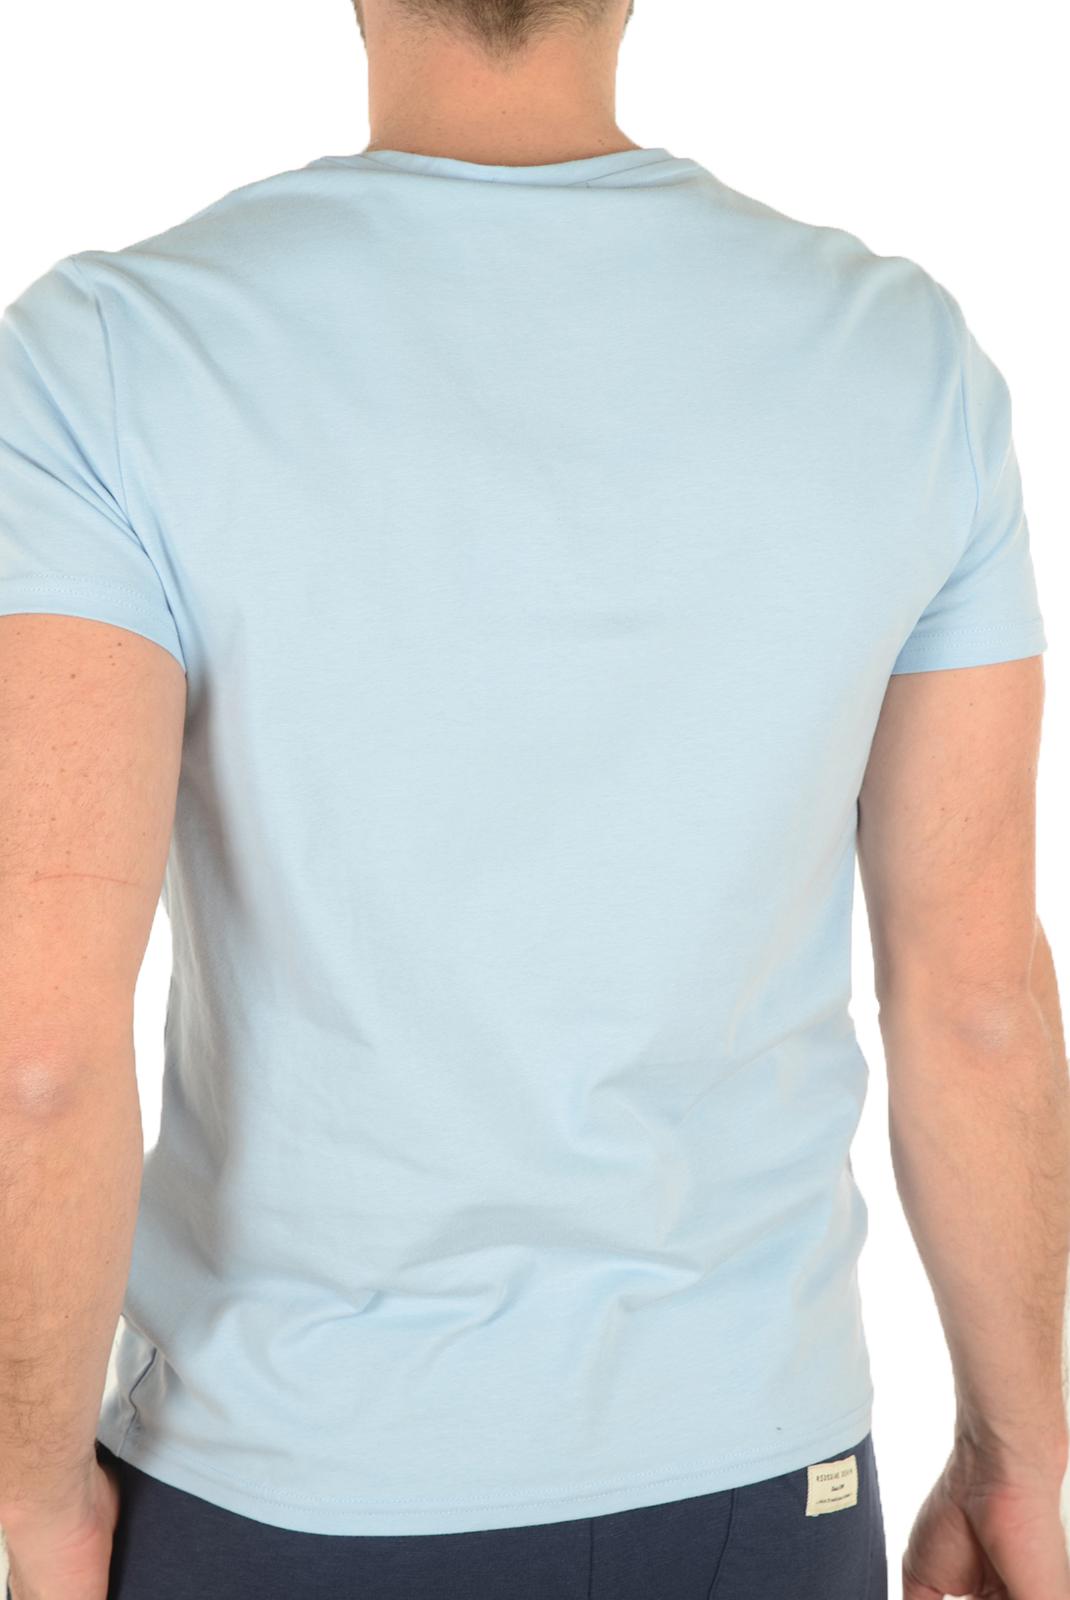 Tee-shirts  Redskins WASABI 2 CALDER SKY BLUE